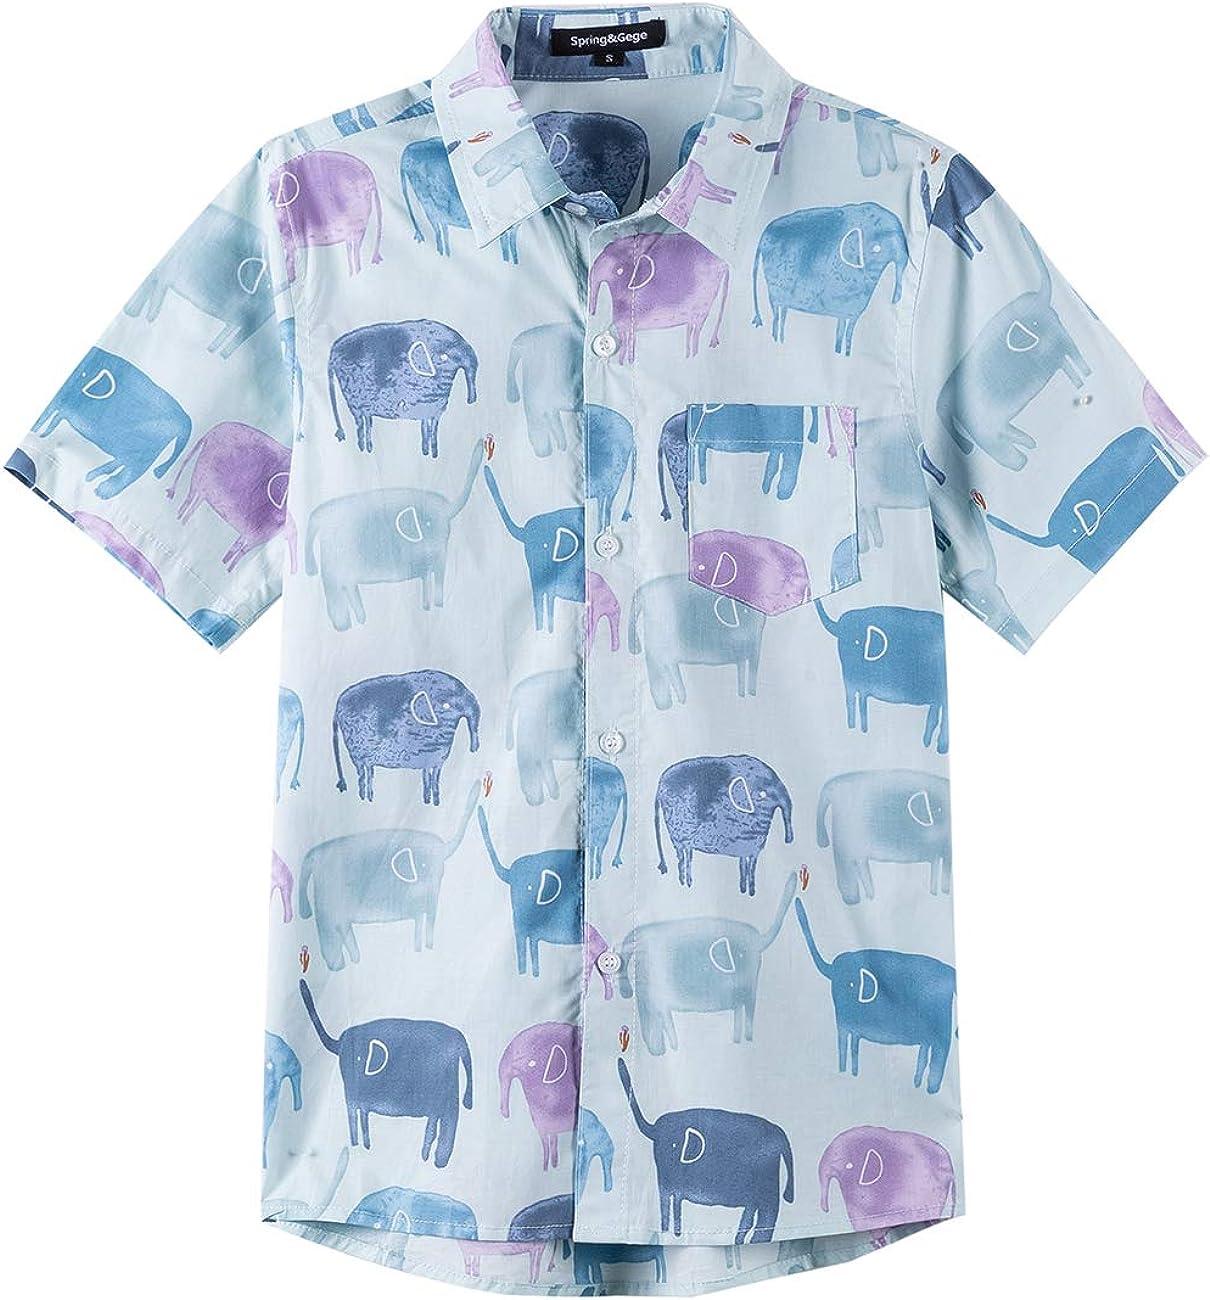 Spring&Gege Little Boys' Short Sleeve Woven poplin Shirt Casual Cartoon Print Aloha Shirts